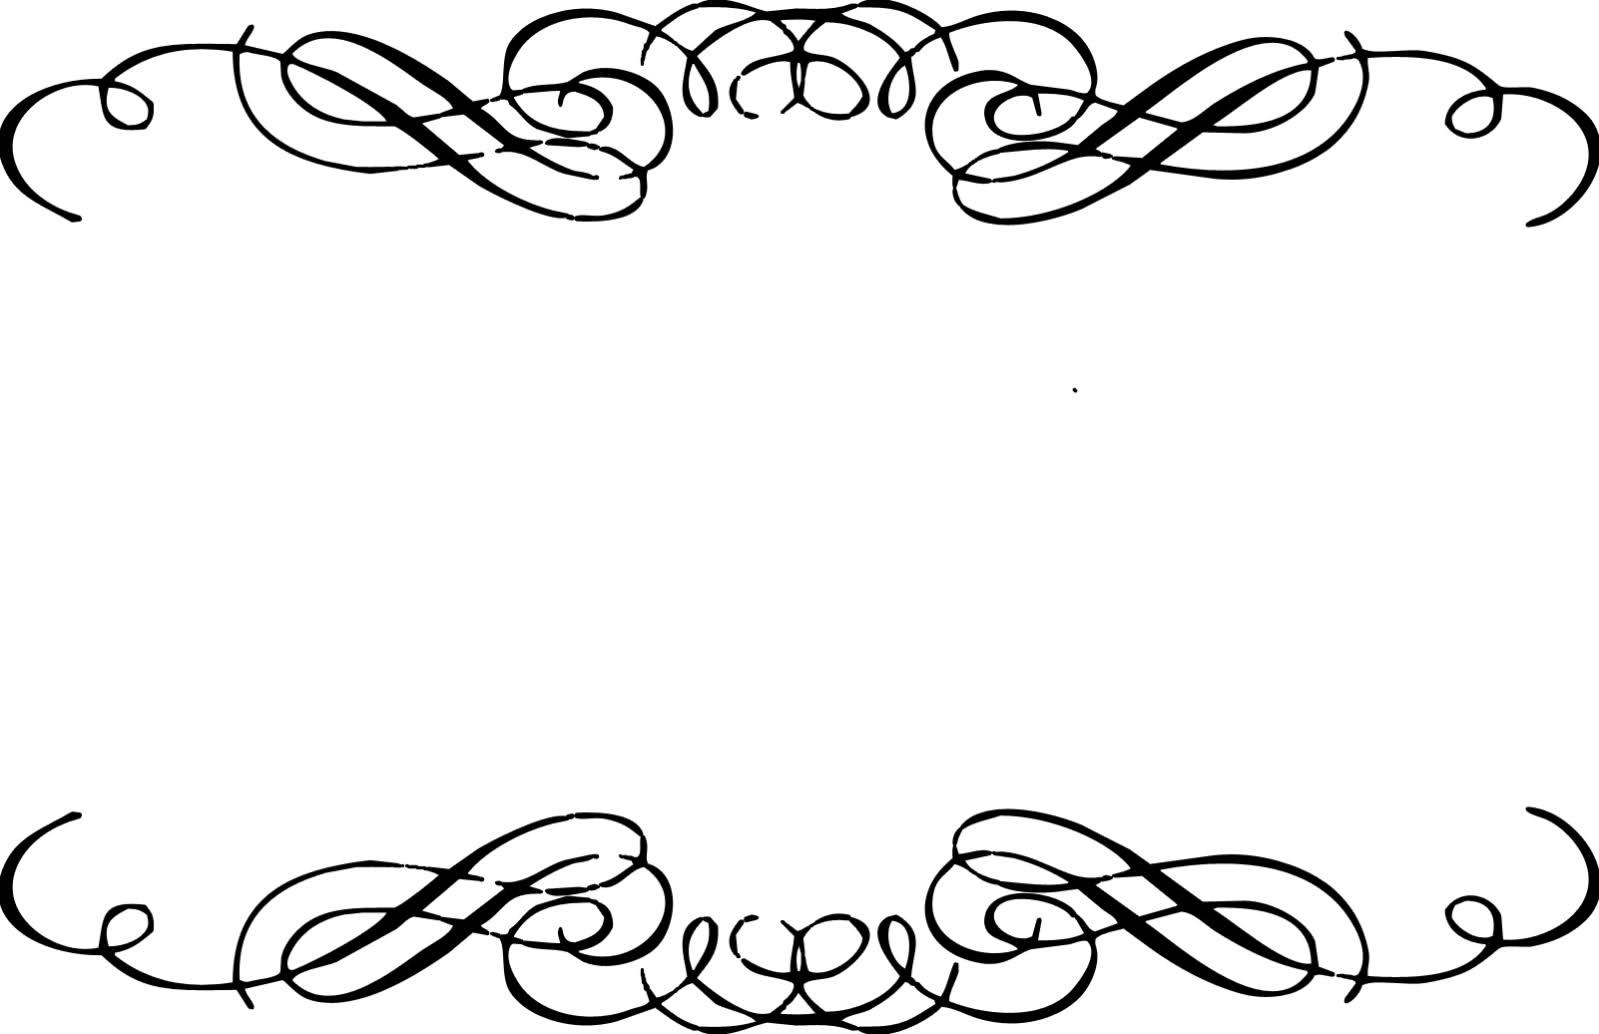 1599x1034 Border Swirls Cliparts 183382